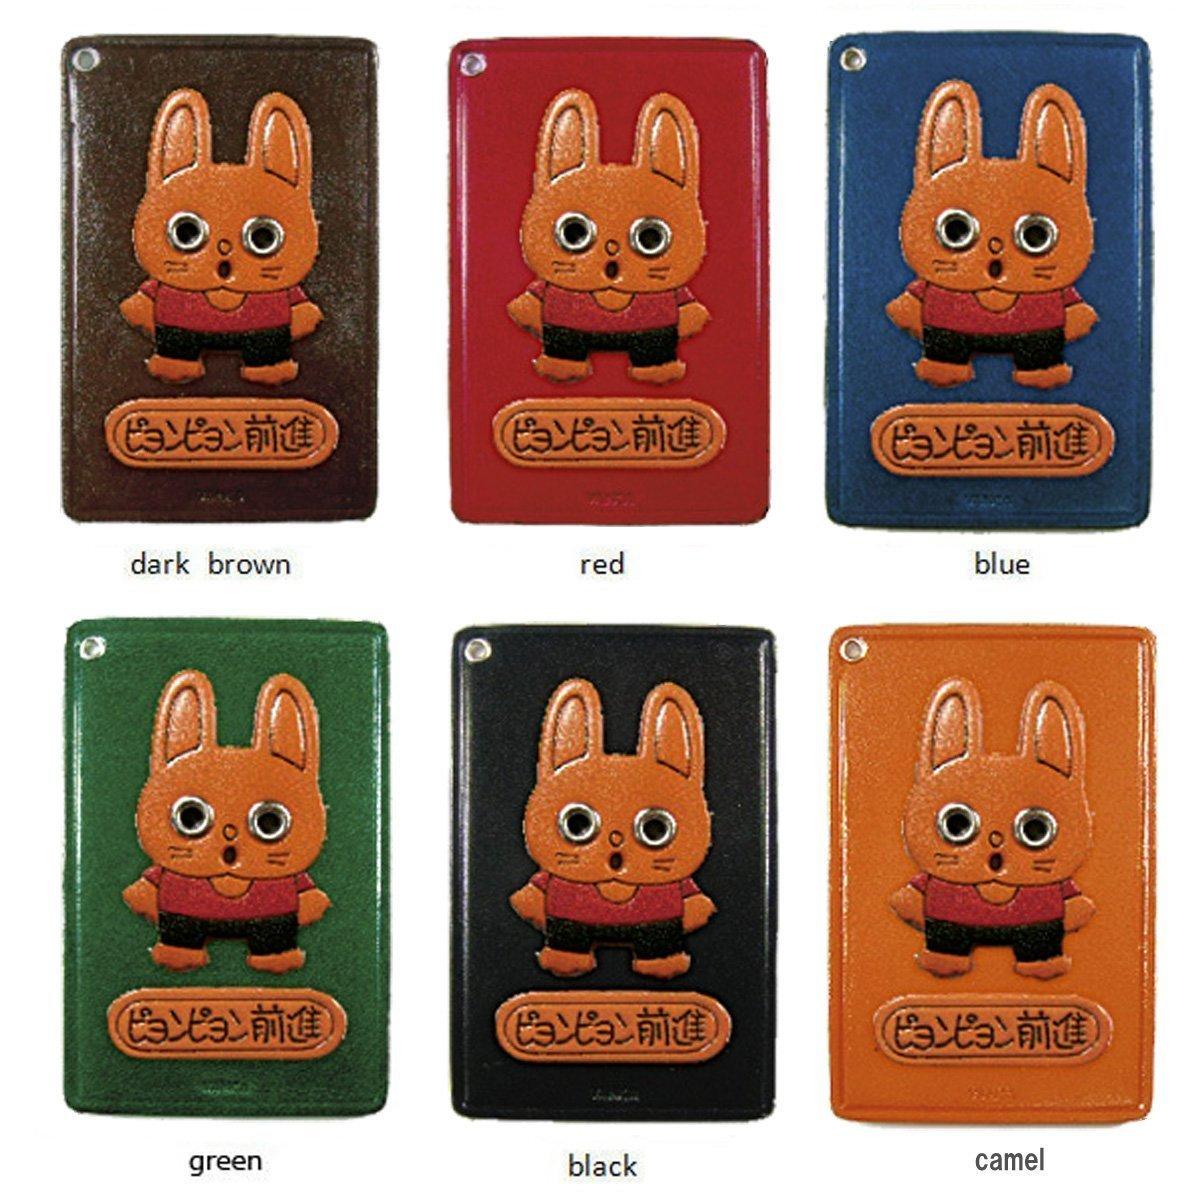 Rabbit Leather Animal Pass/ID/Credit/Card Holder/CaseVANCA Handmade in Japan